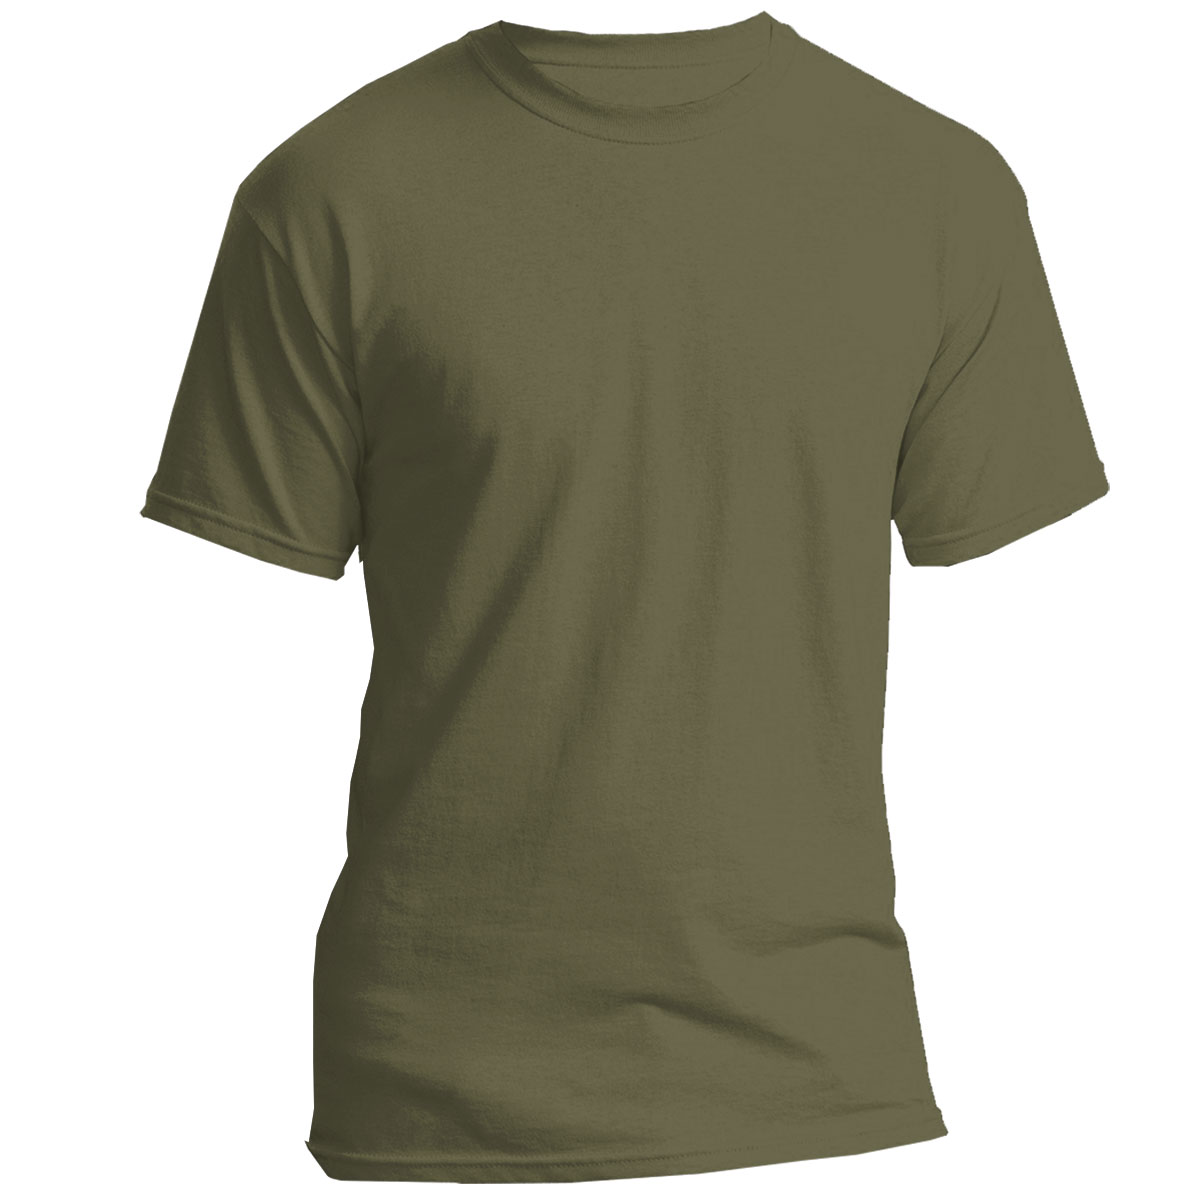 fcbcd55e14ca Koszulka Regular Premium do nadruku Gramatura  190 g m² Rozmiar  L ...